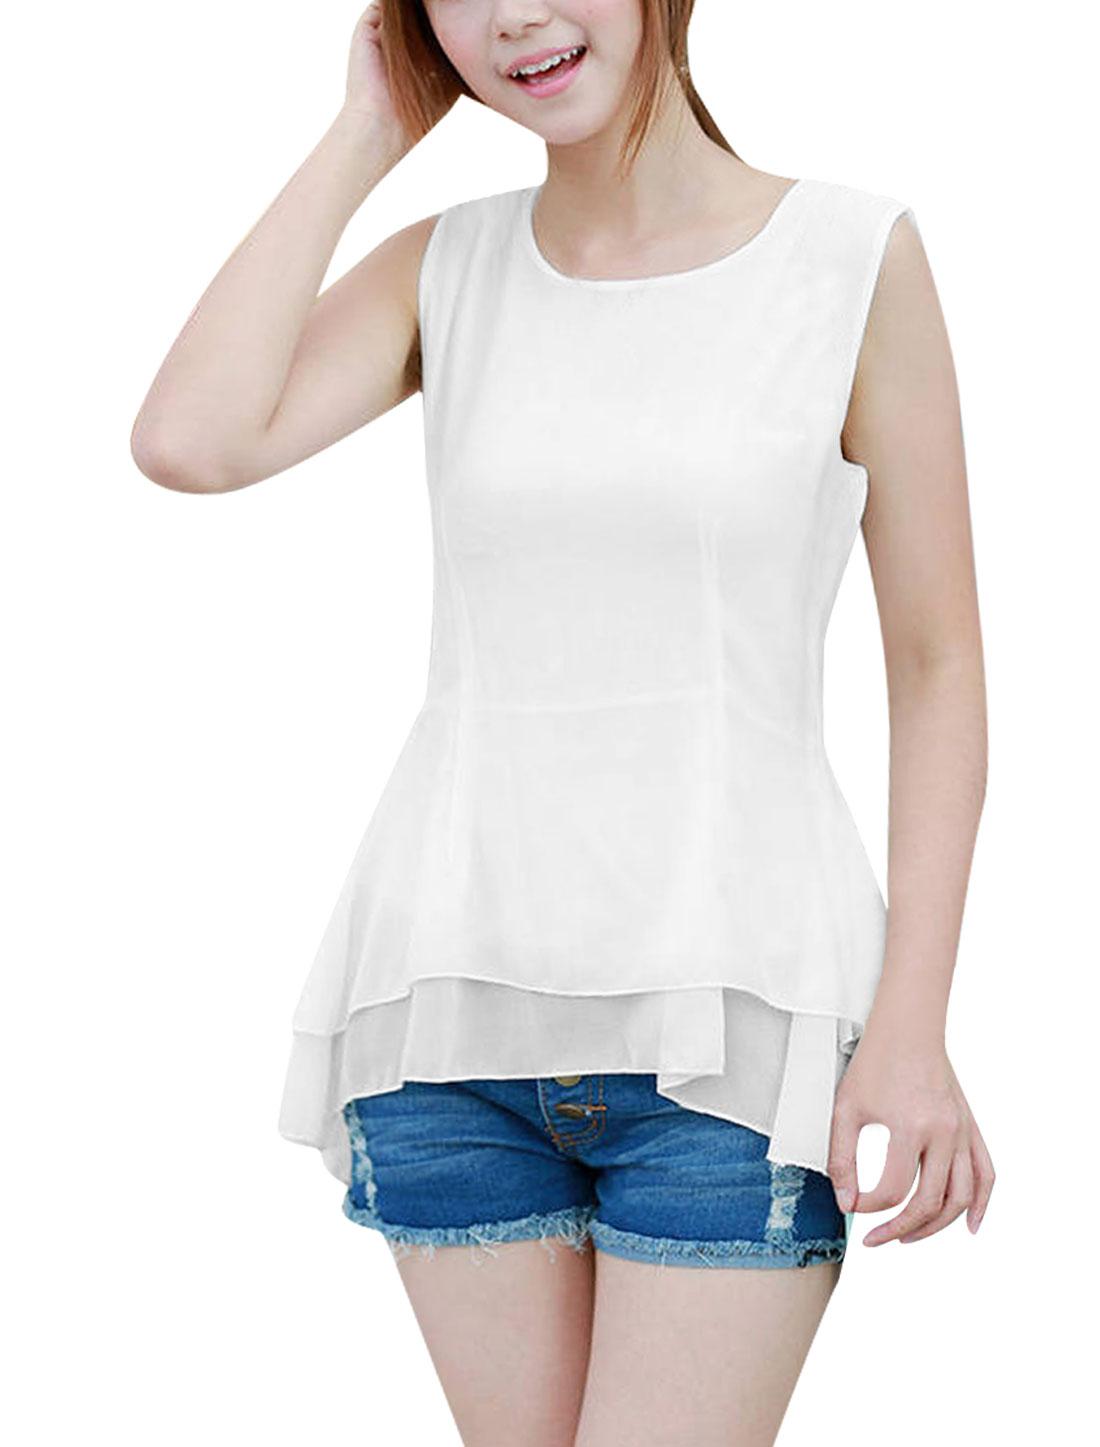 Women Fashion Round Neck Sleeveless Splice Pure White Peplum Tops XS